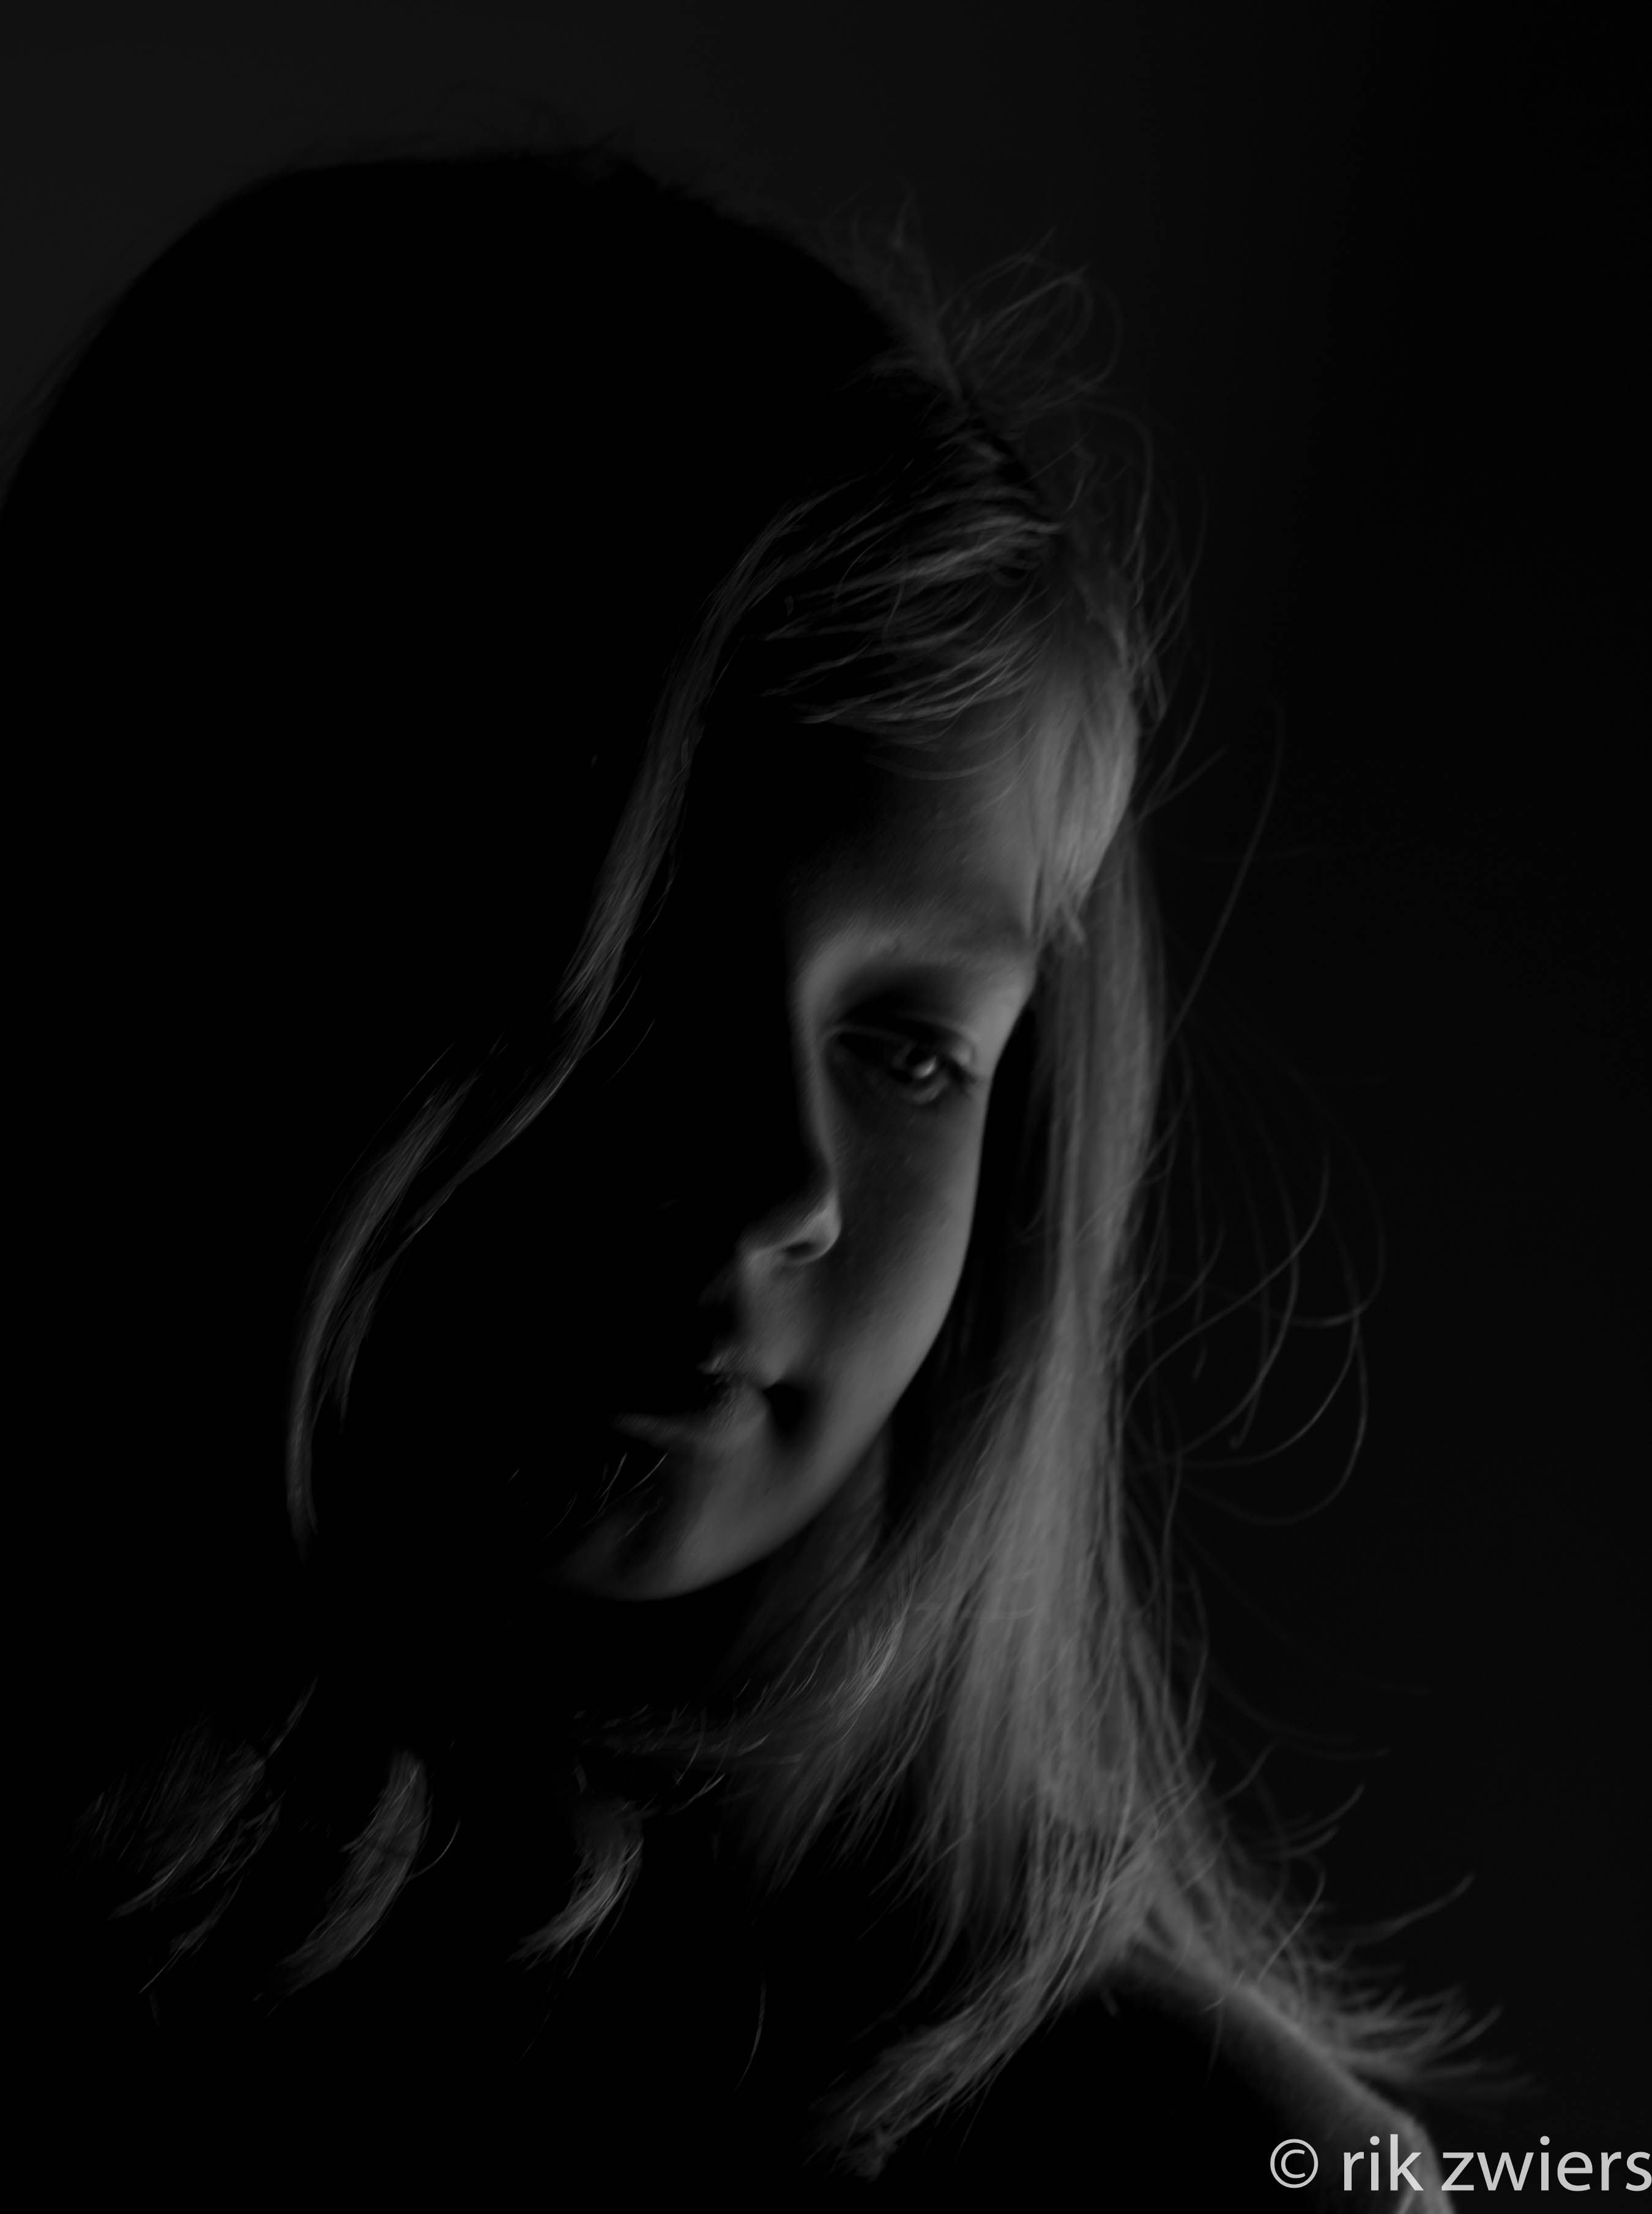 #zwartwit #lowkey #portret van mijn dochter